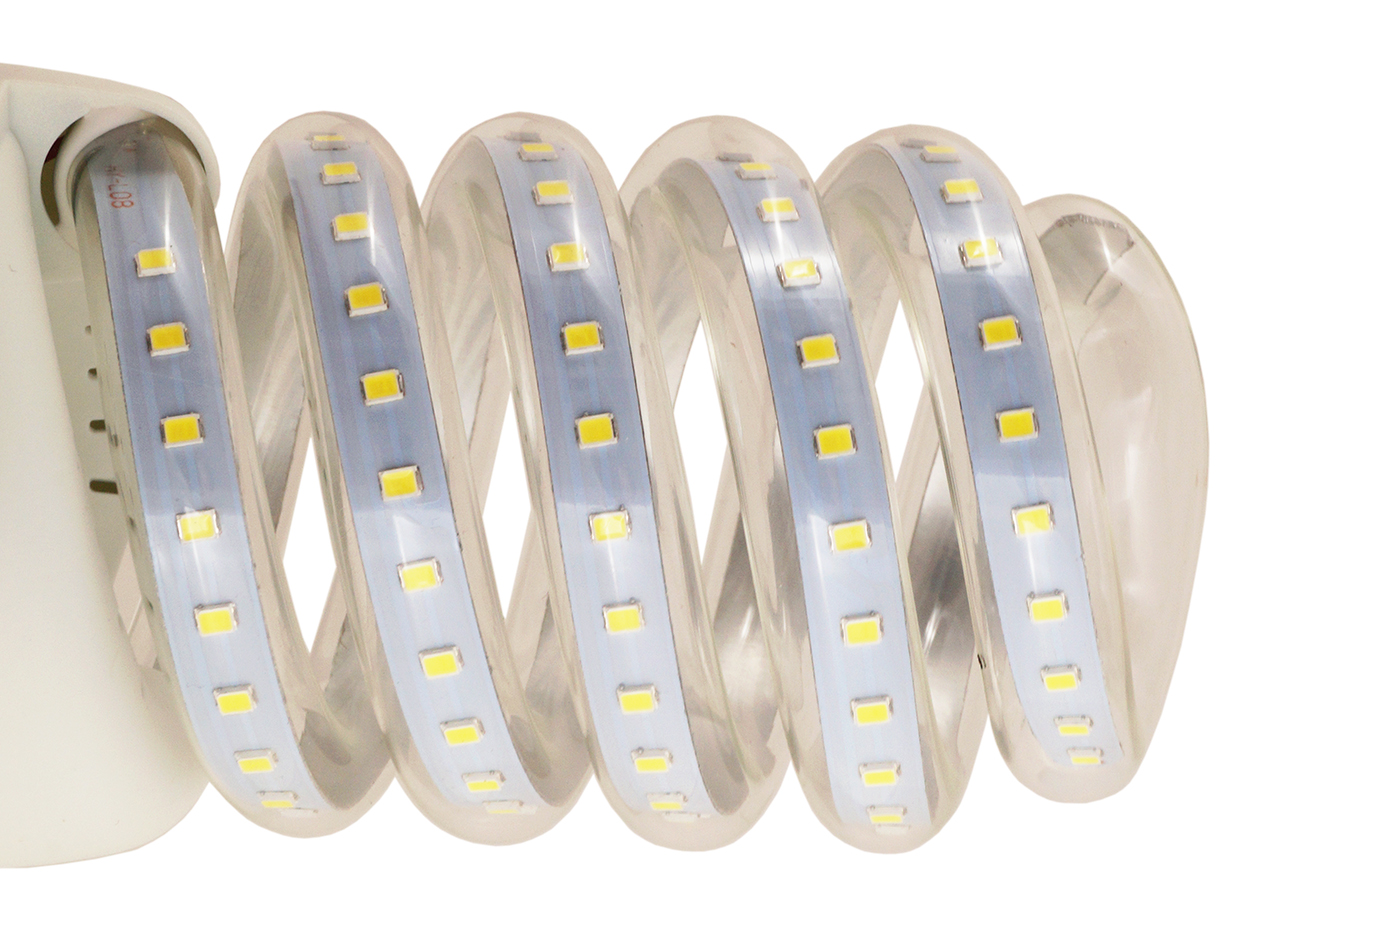 Bes 20213 lampadine e adattatori beselettronica for Lampadine watt